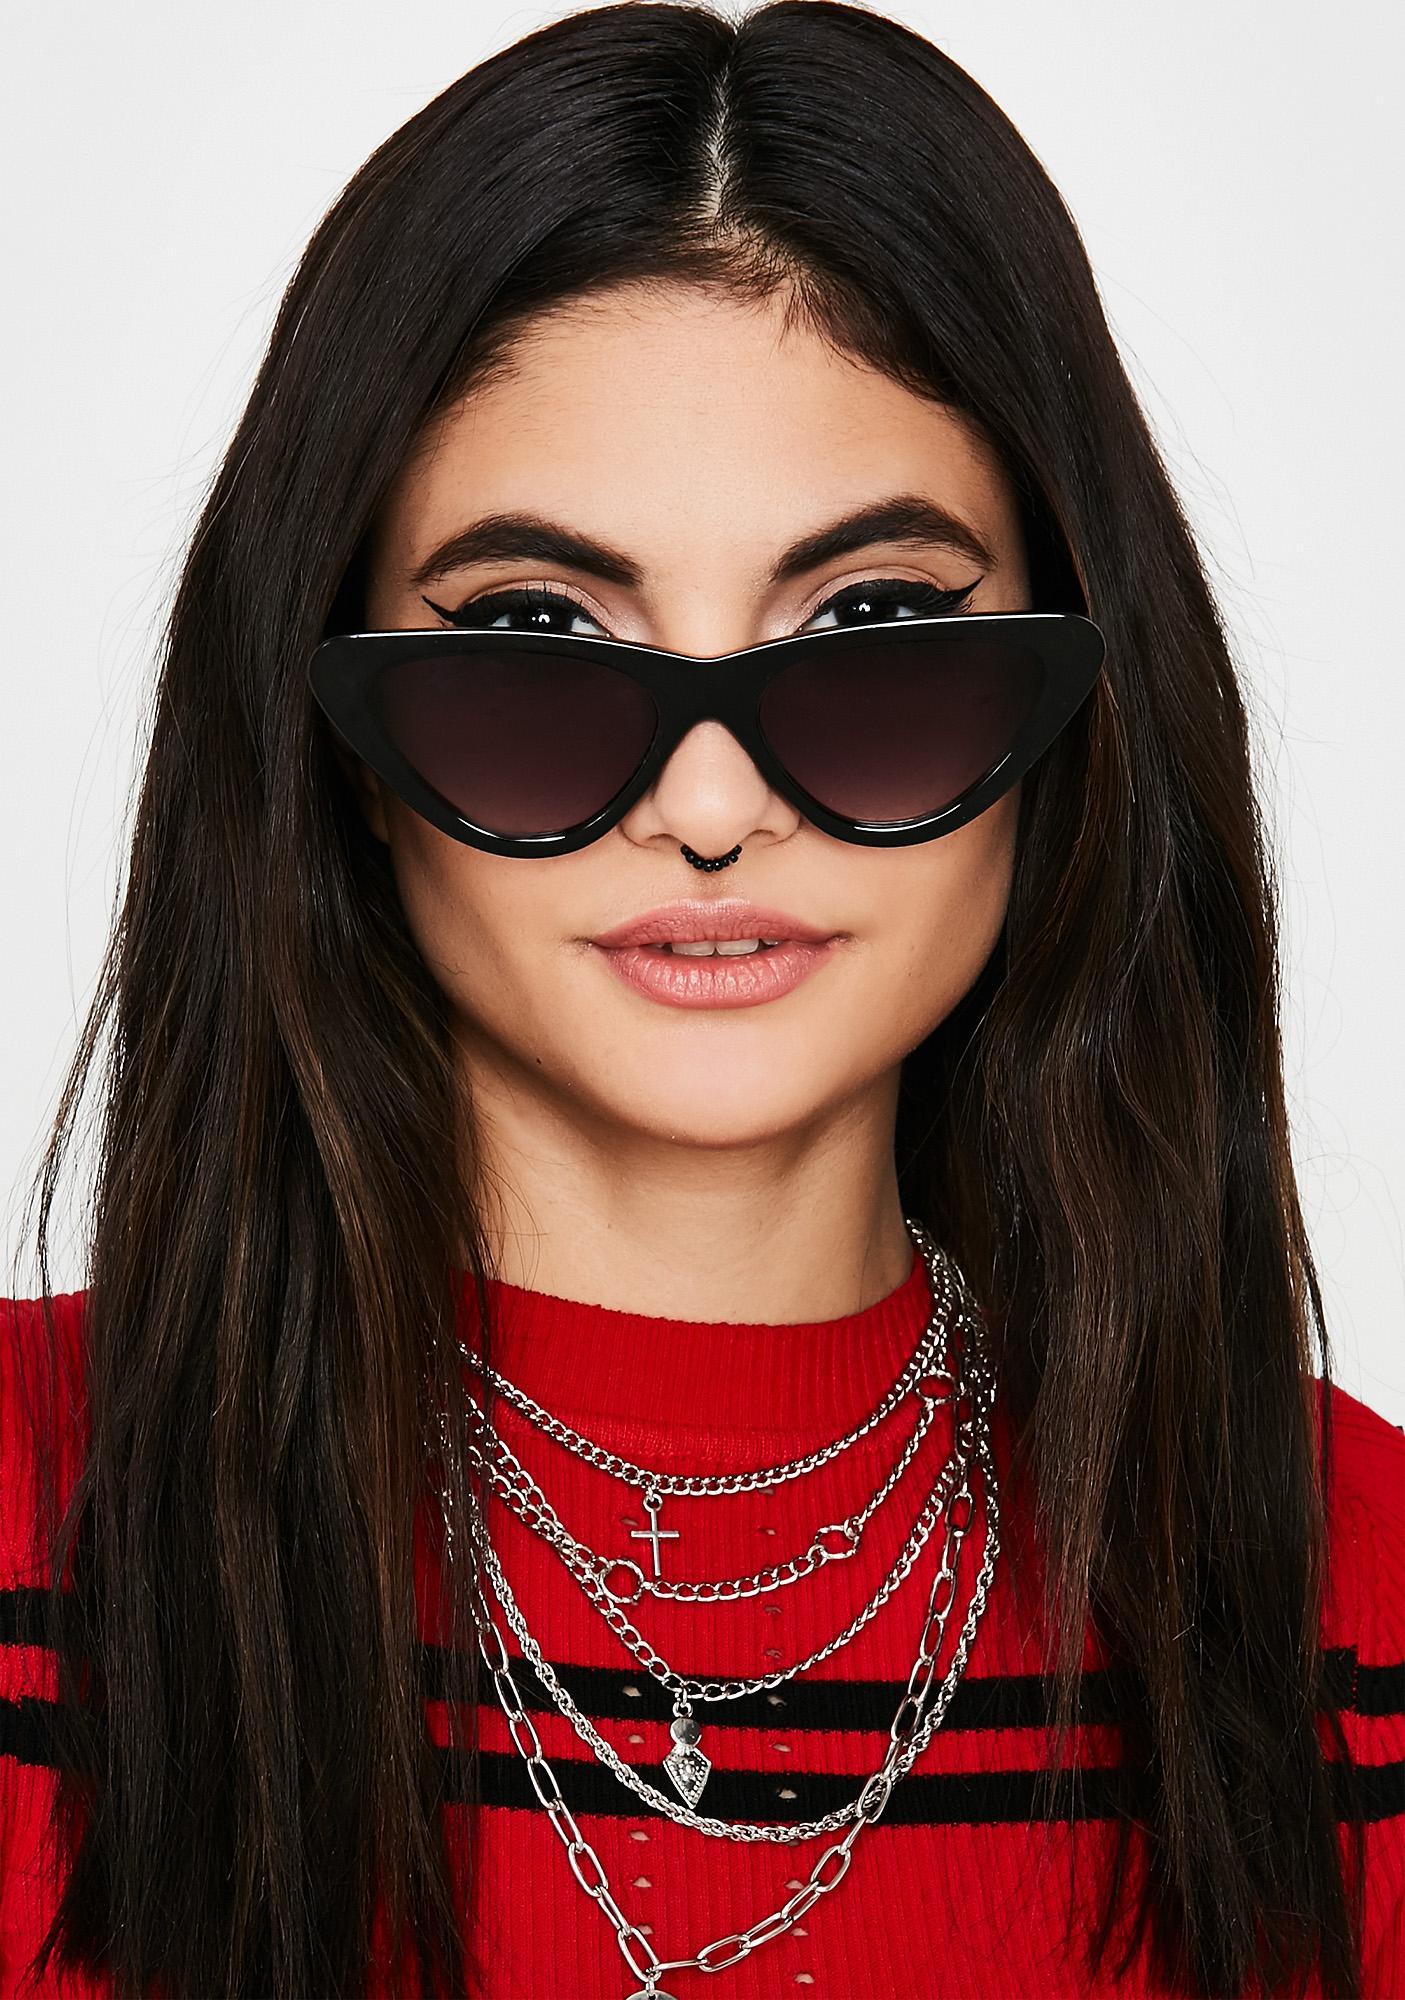 Spill The Tea Sunglasses